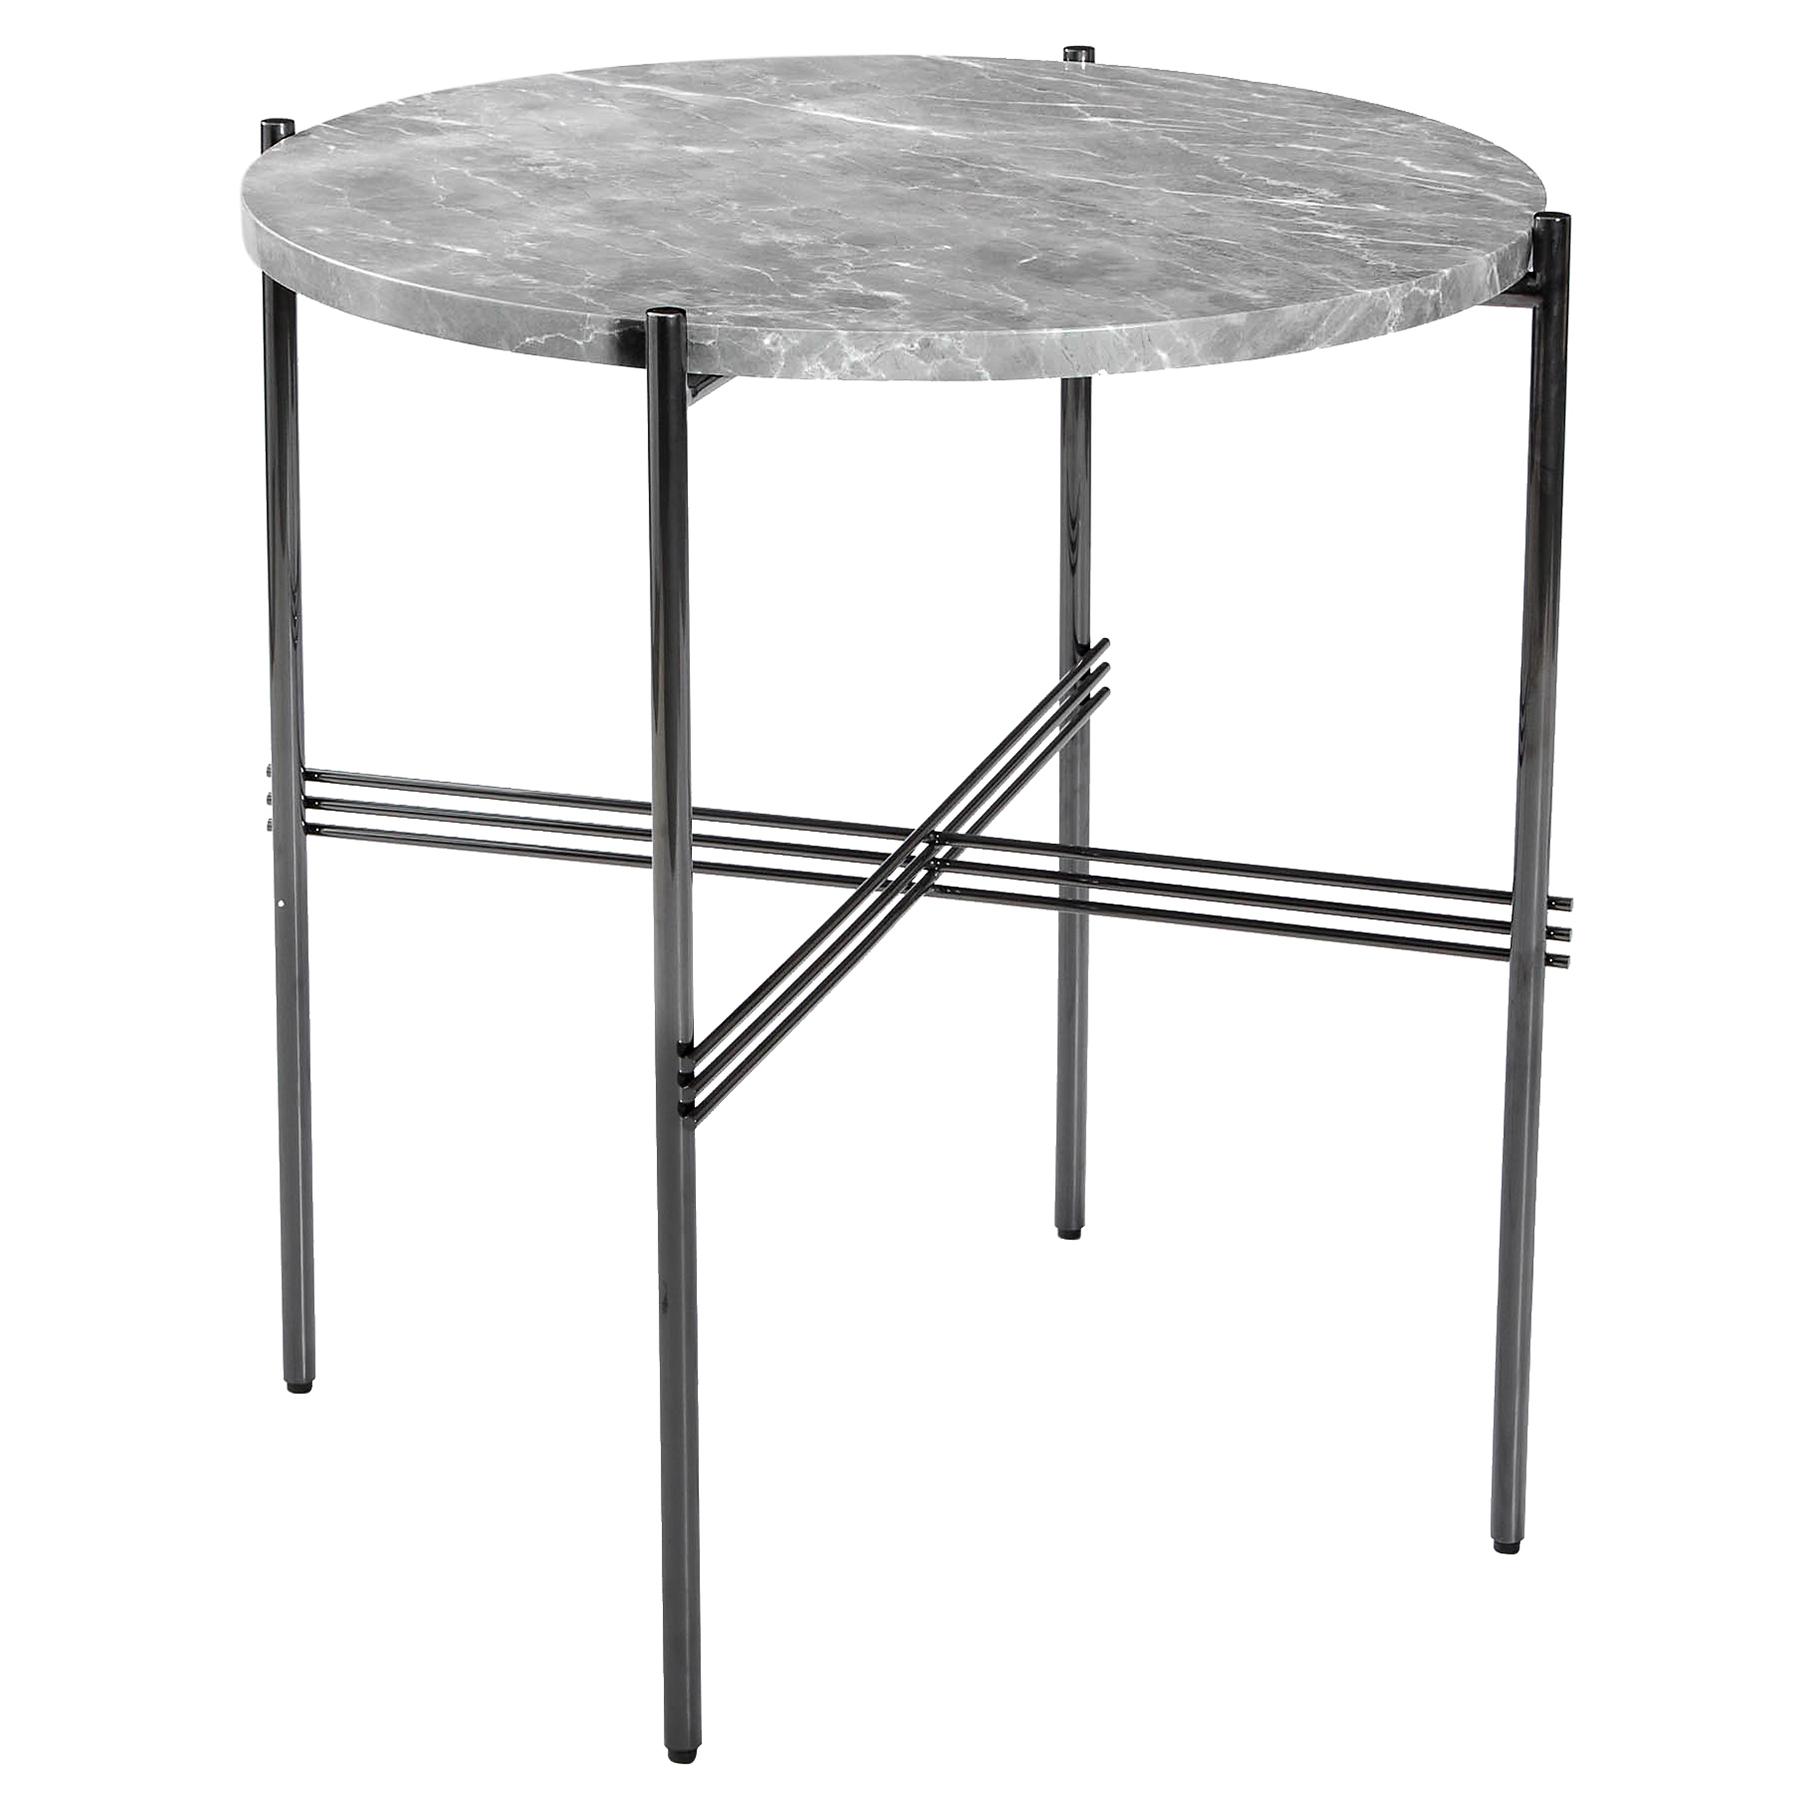 Manuk Loft Gunmetal Grey Steel Marble Bistro Table